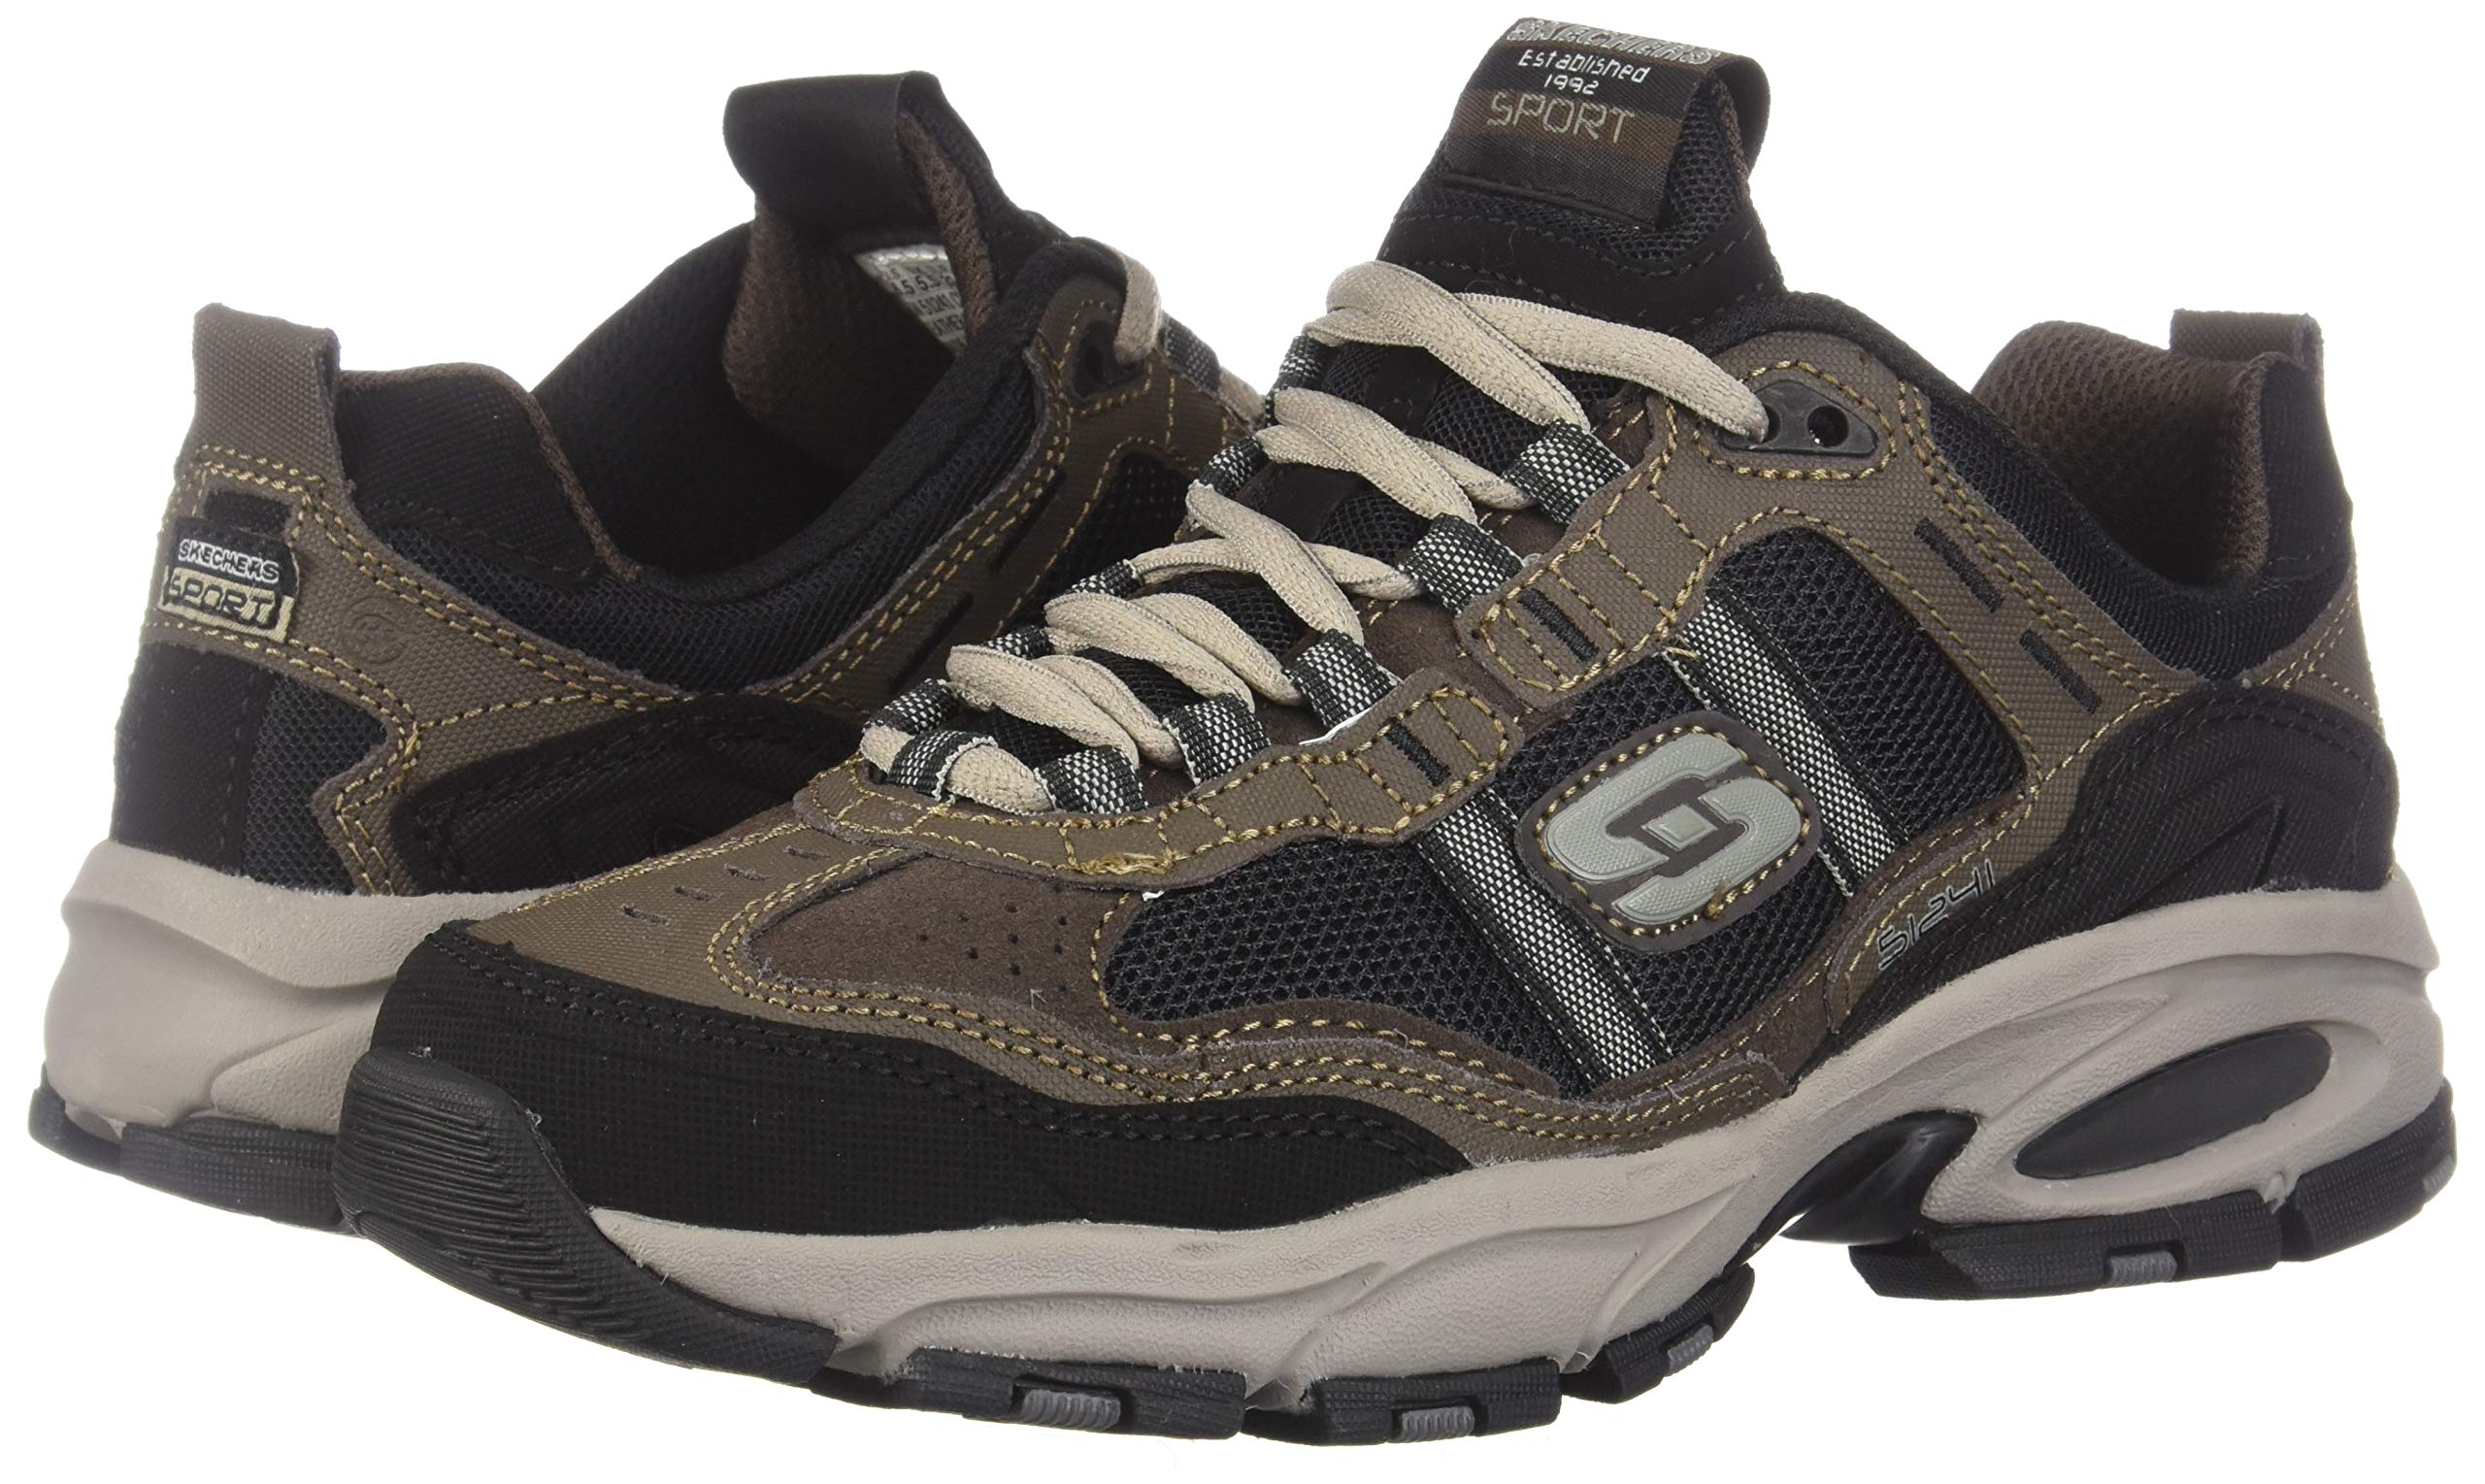 Skechers Sport Men's Vigor 2.0 Trait Memory Foam Sneaker, Brown/Black, 7 M US by Skechers (Image #6)